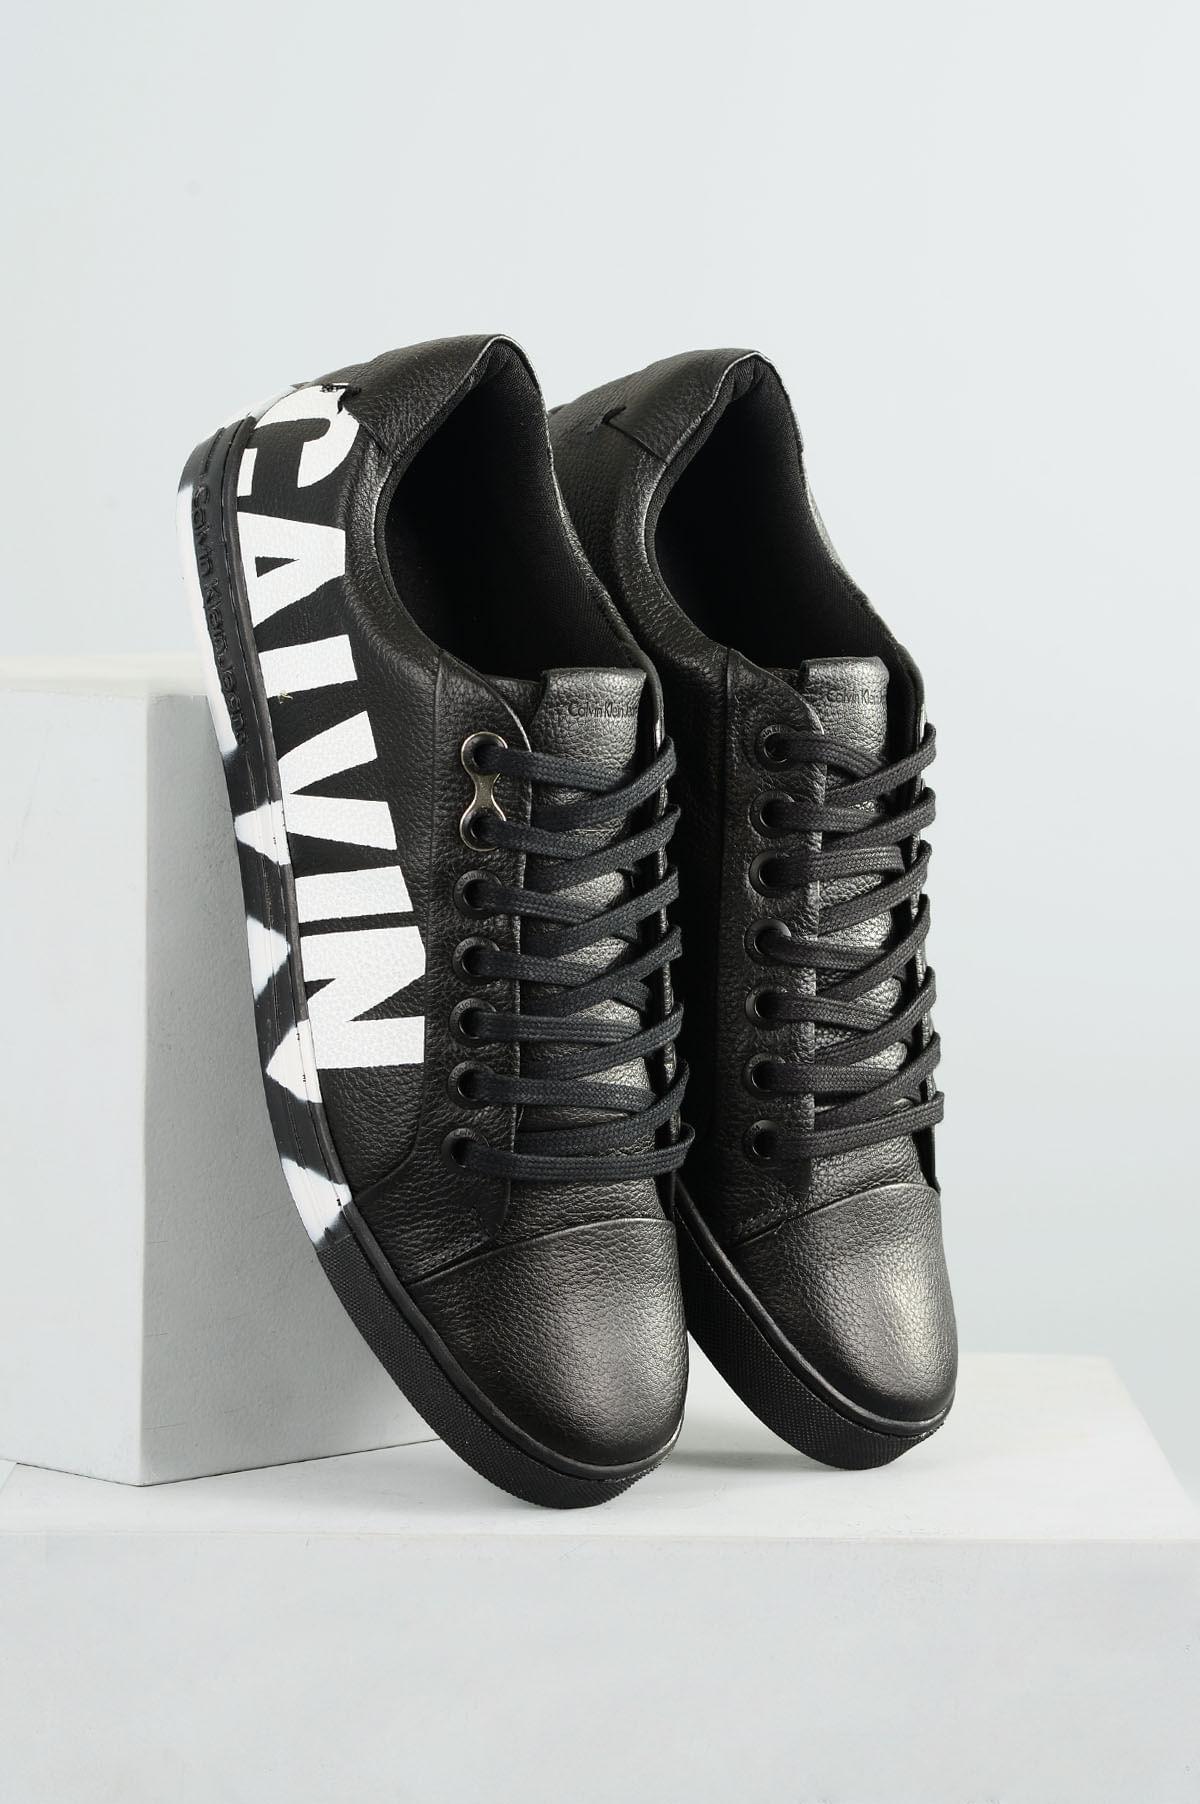 78b9e42908ed0 Sapatênis Masculino Calvin Klein Pedro CR-PRETO - Mundial Calçados